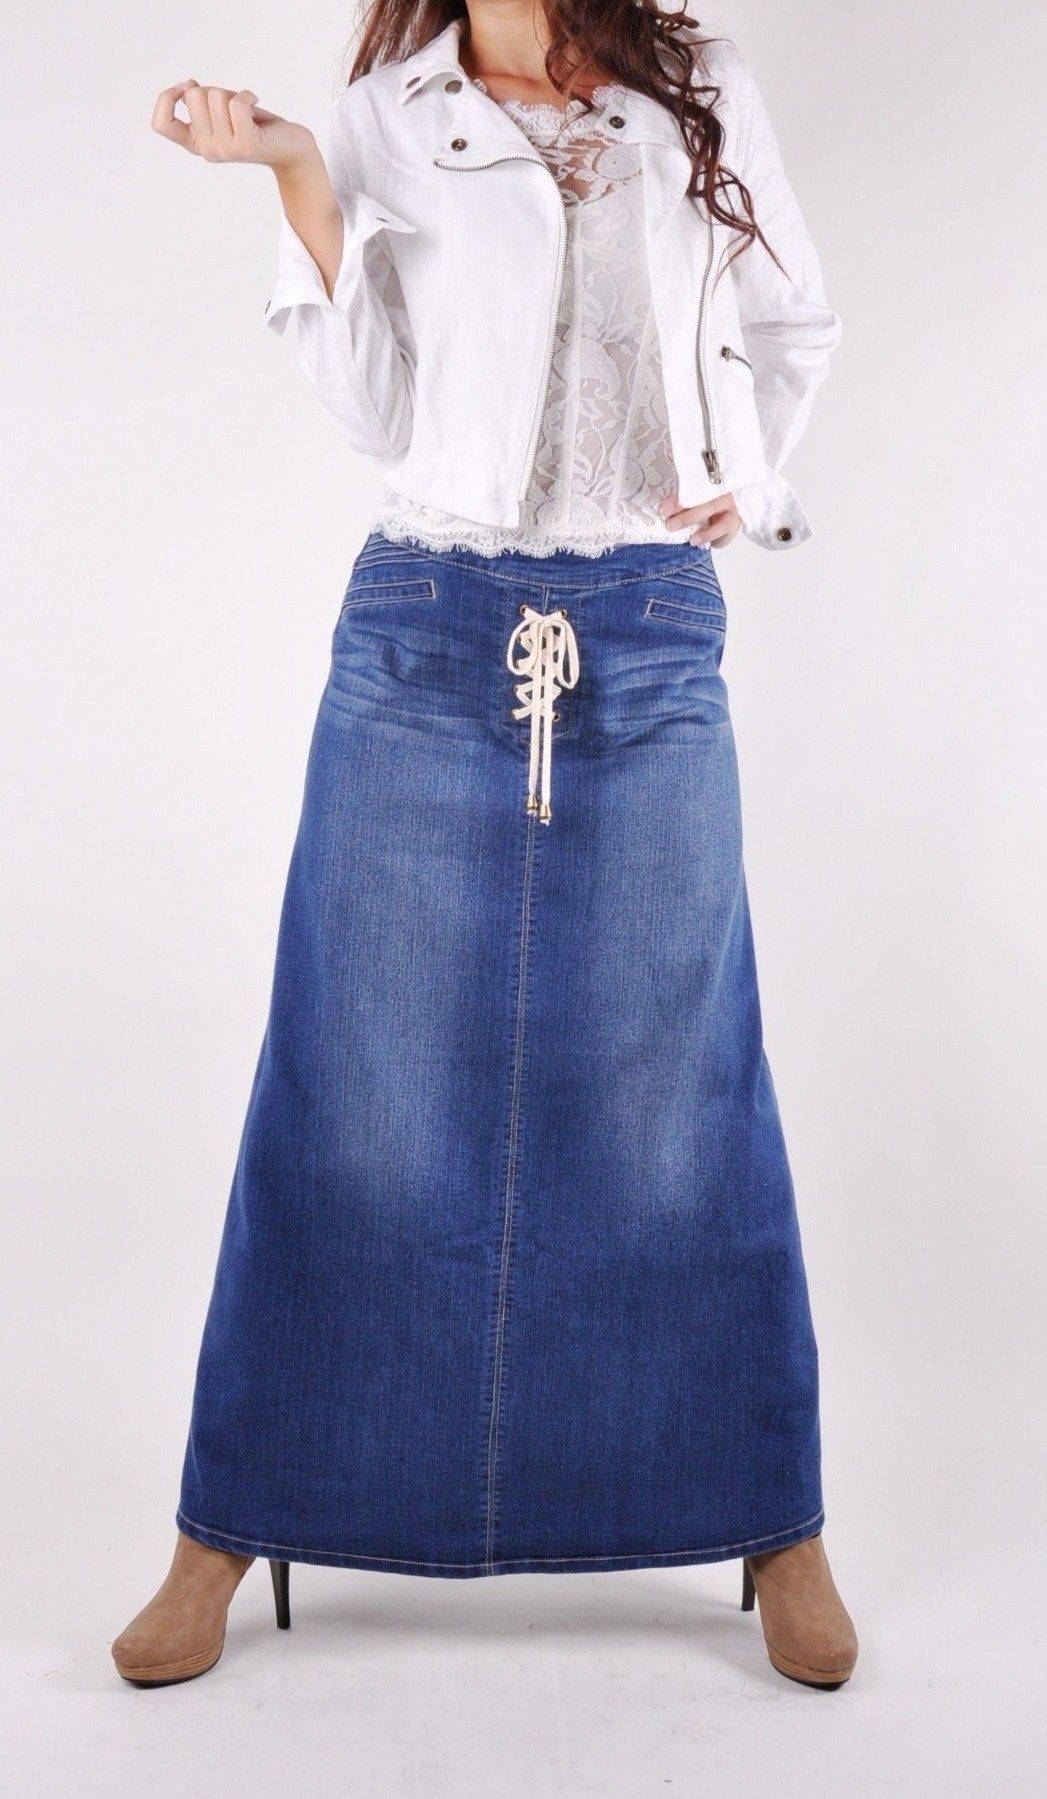 Fashion style Long cute denim skirts for woman